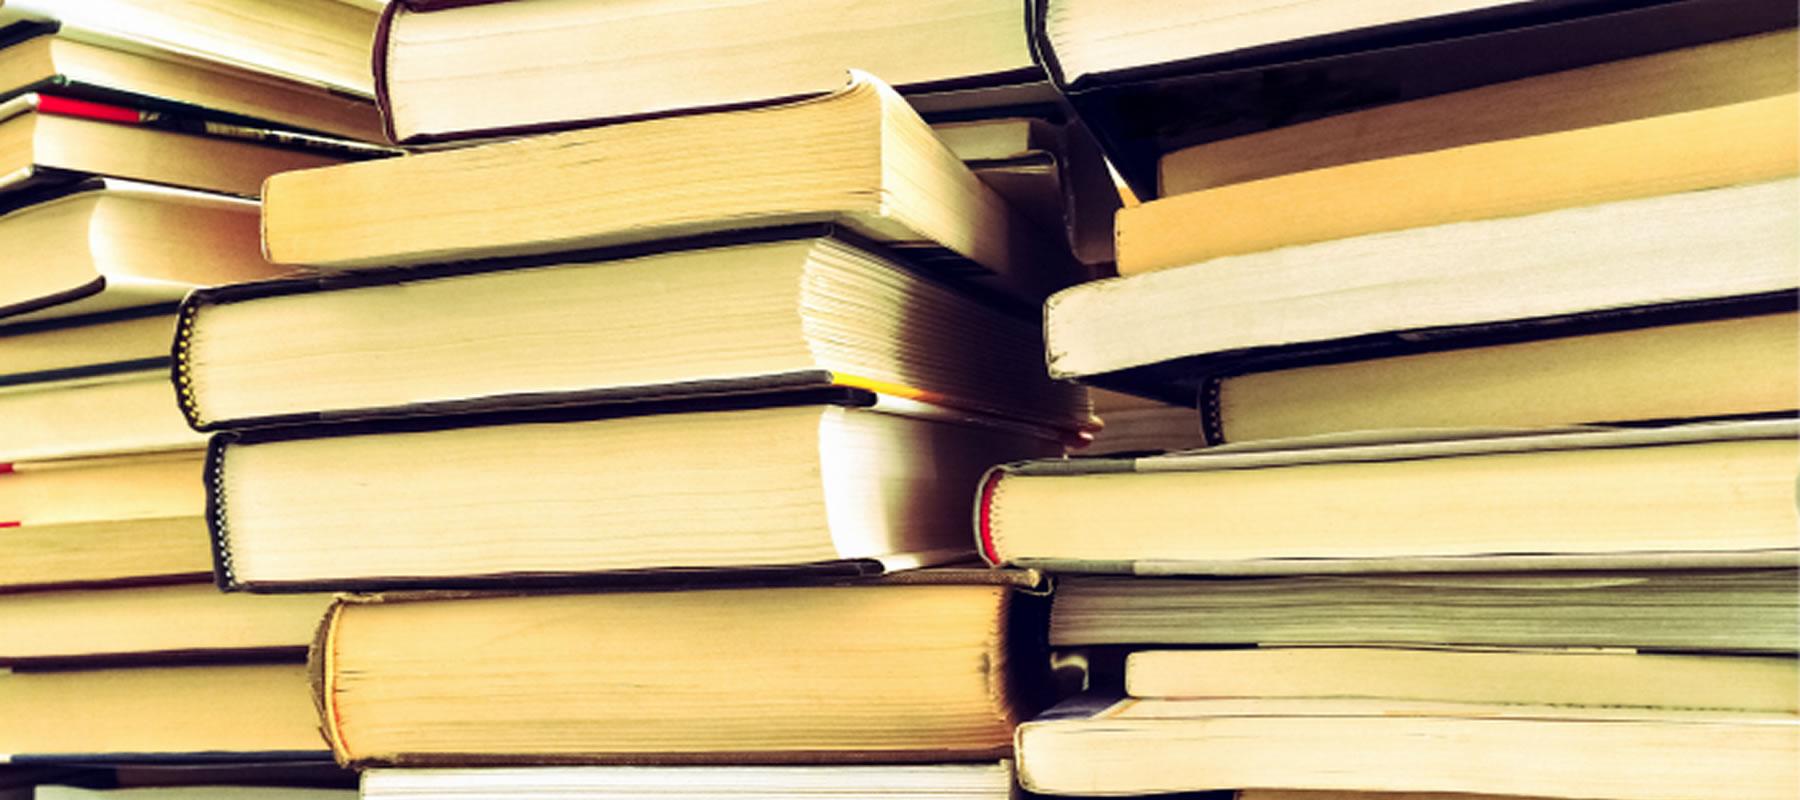 O que ler a seguir? OU O pote de livros